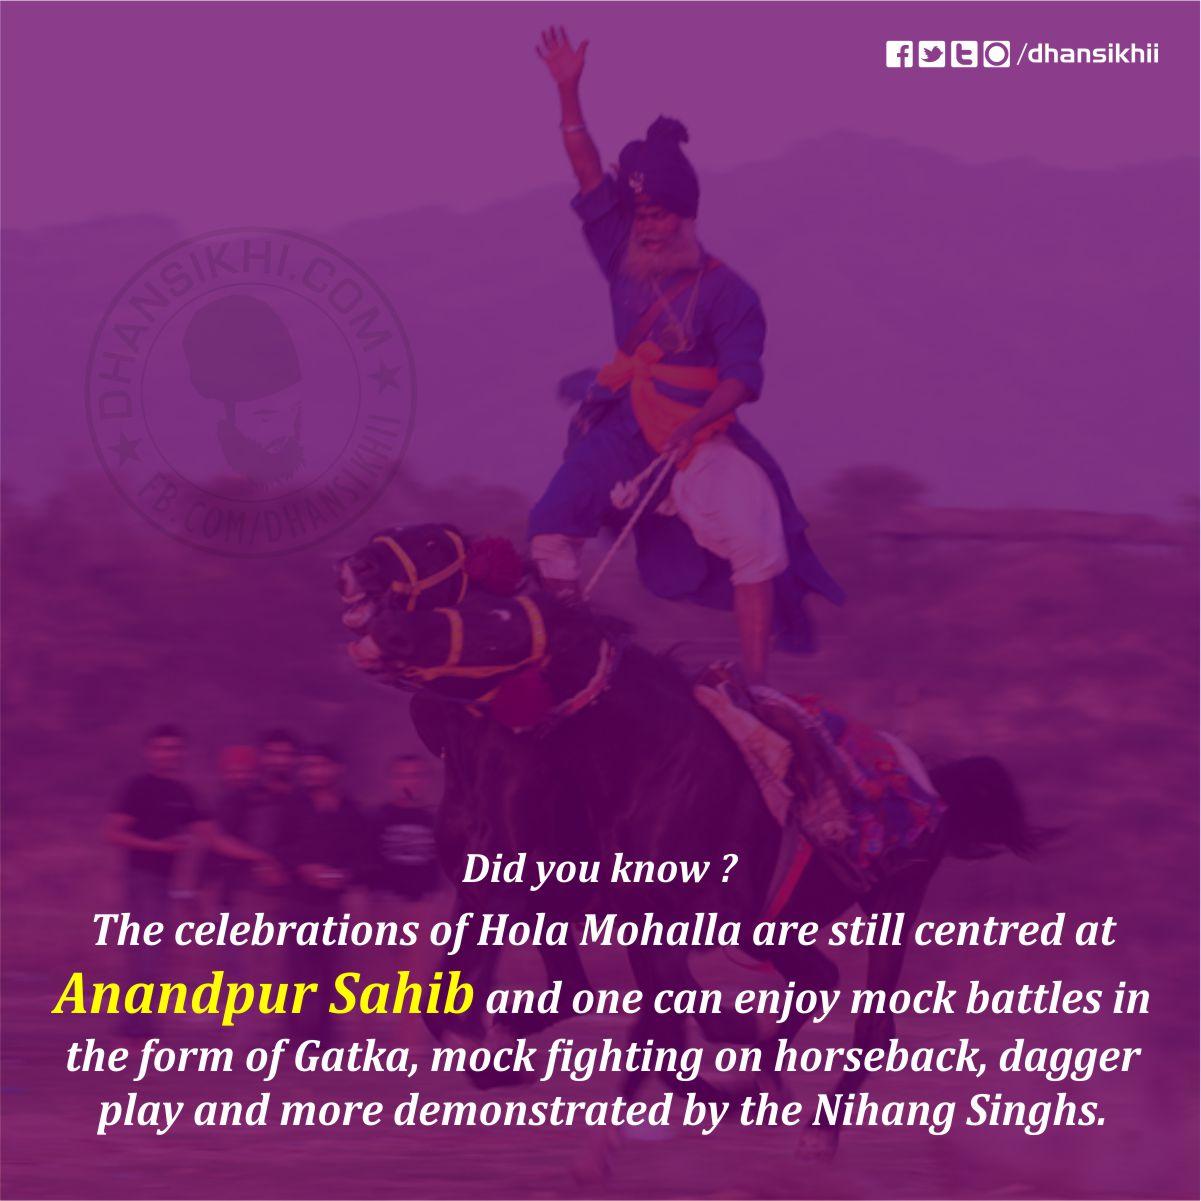 Dhansikhi-Event Greetings-Web-insta-Hola Mohalla